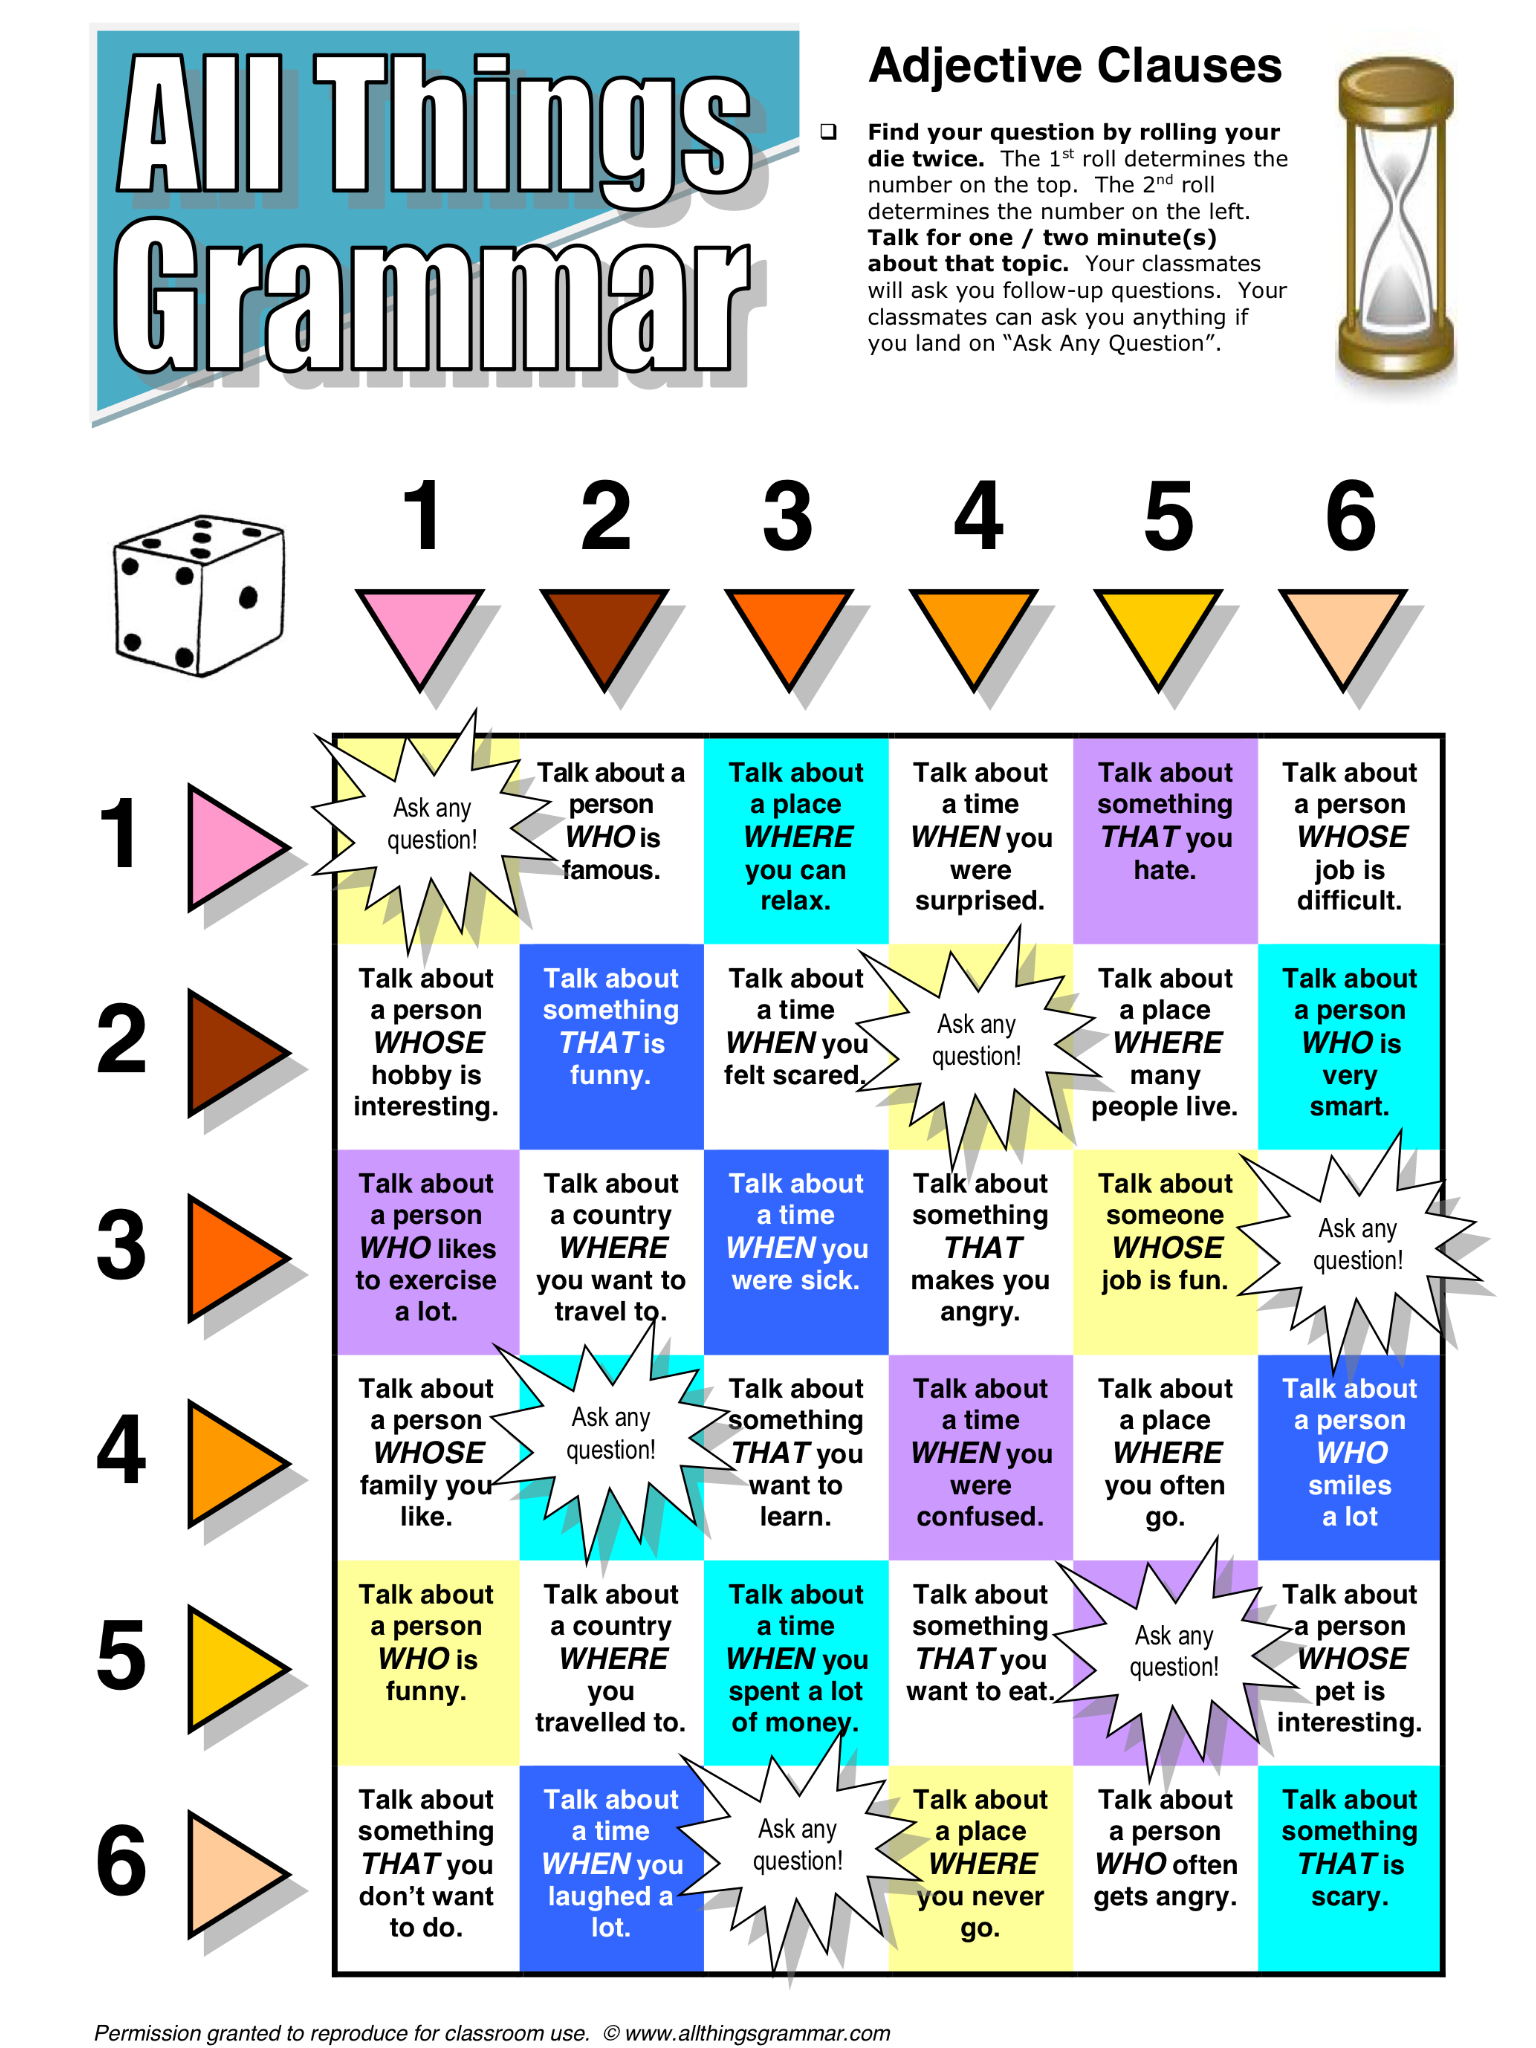 English Grammar Adjective Clauses Lthingsgrammar